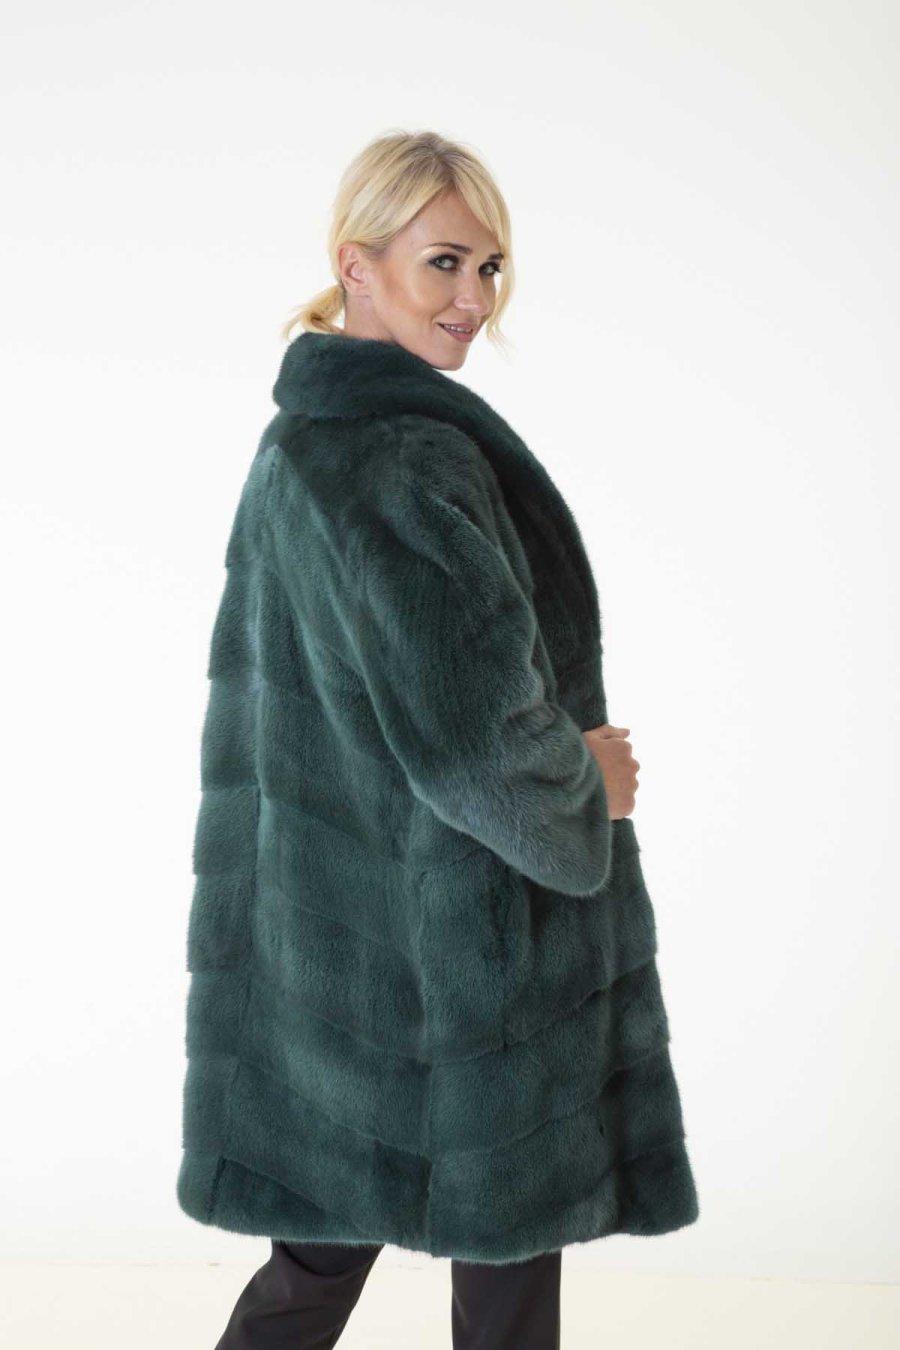 Shock Green Male Mink Farm Jacket | Пальто из меха норки – цвет Shock Green - Sarigianni Furs